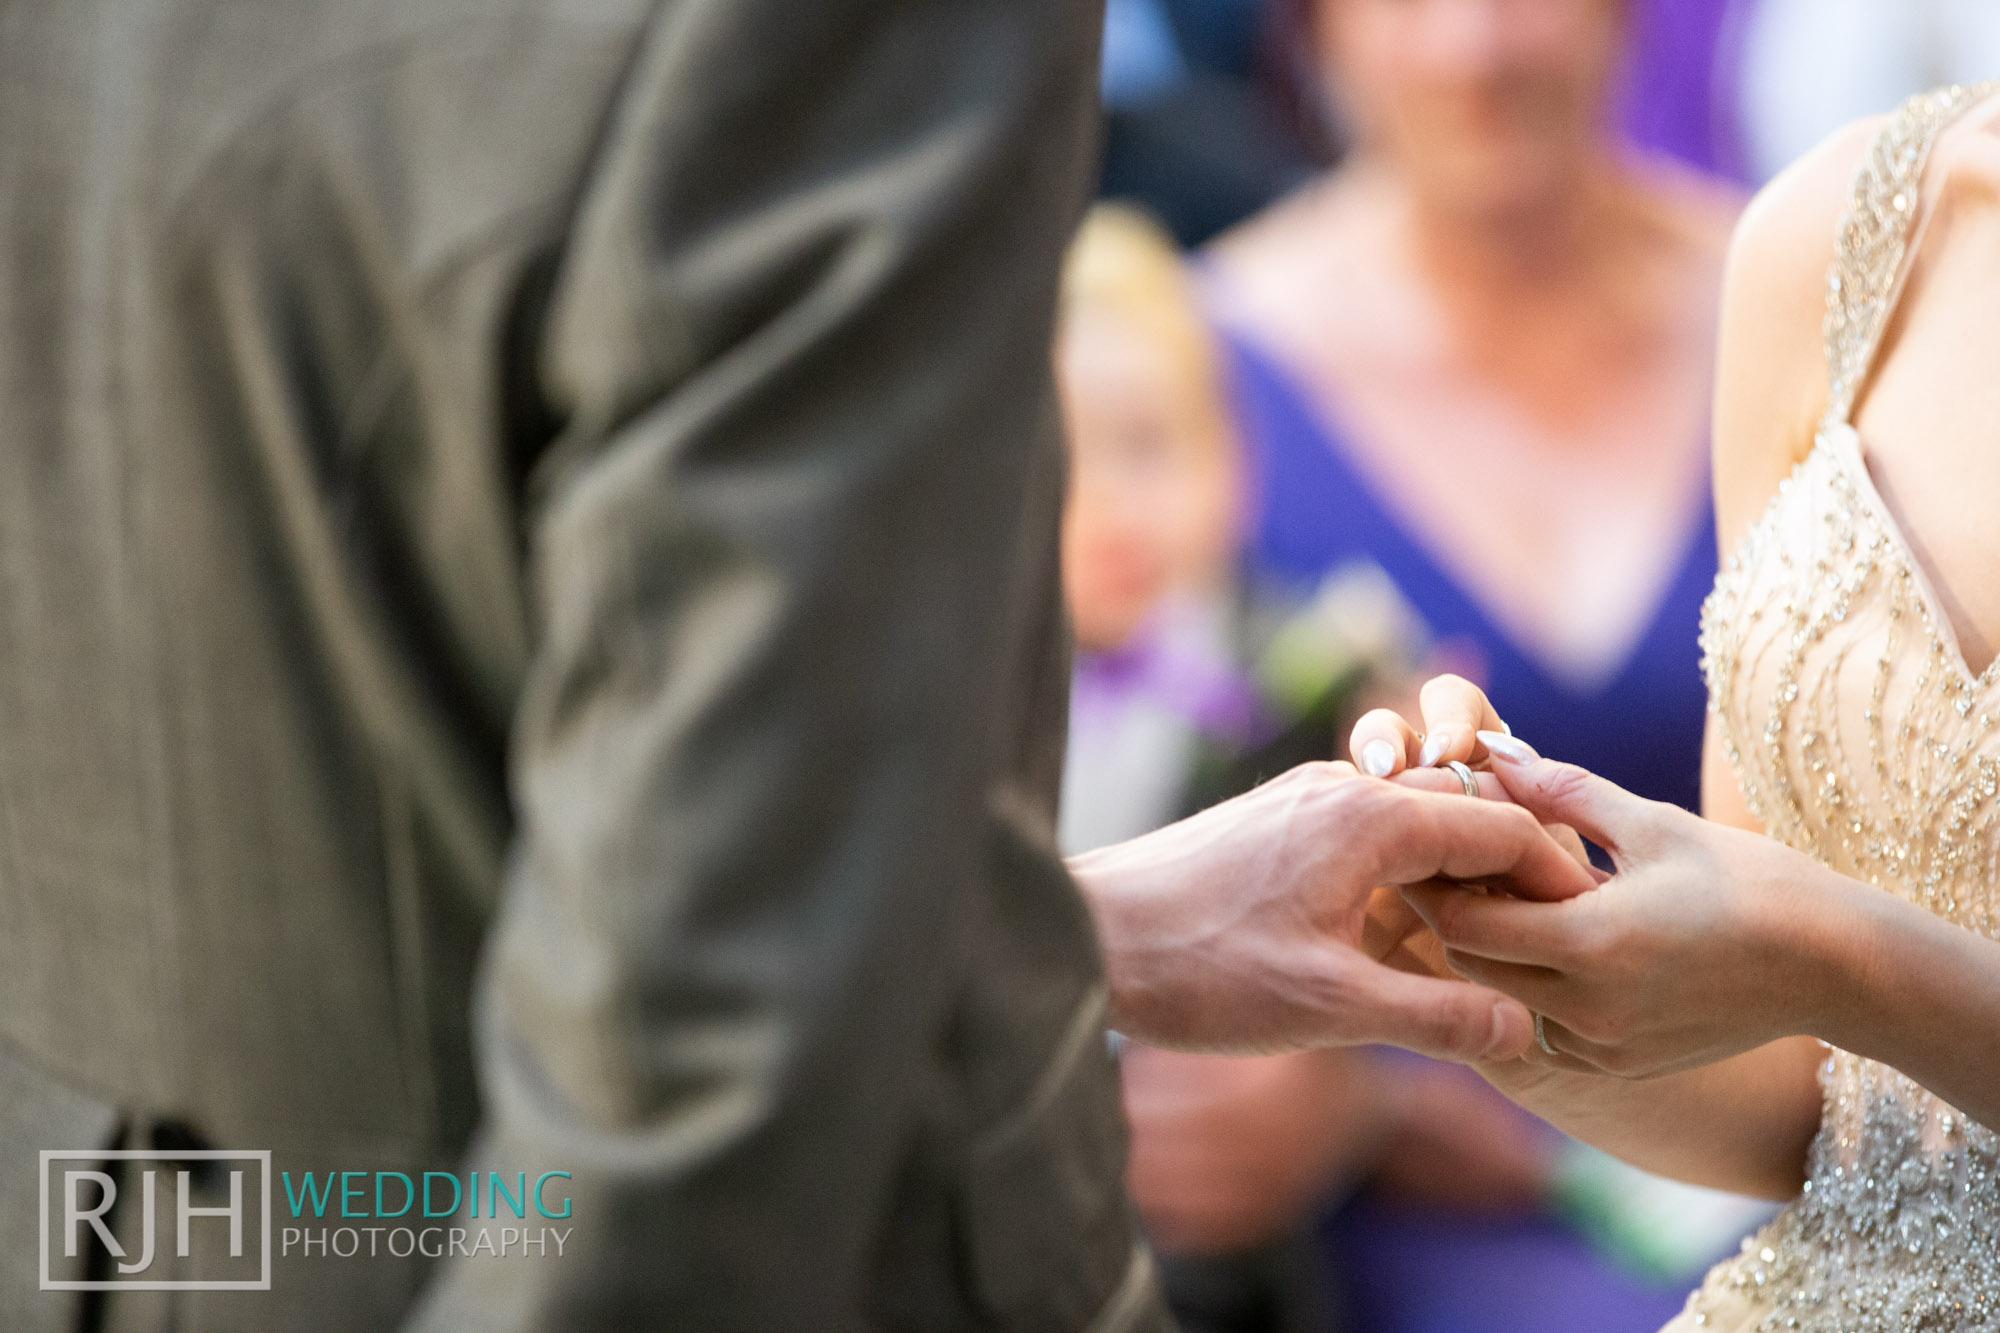 Oulton Hall Wedding Photography_Goodwill-Hall_023_RJH17430.jpg